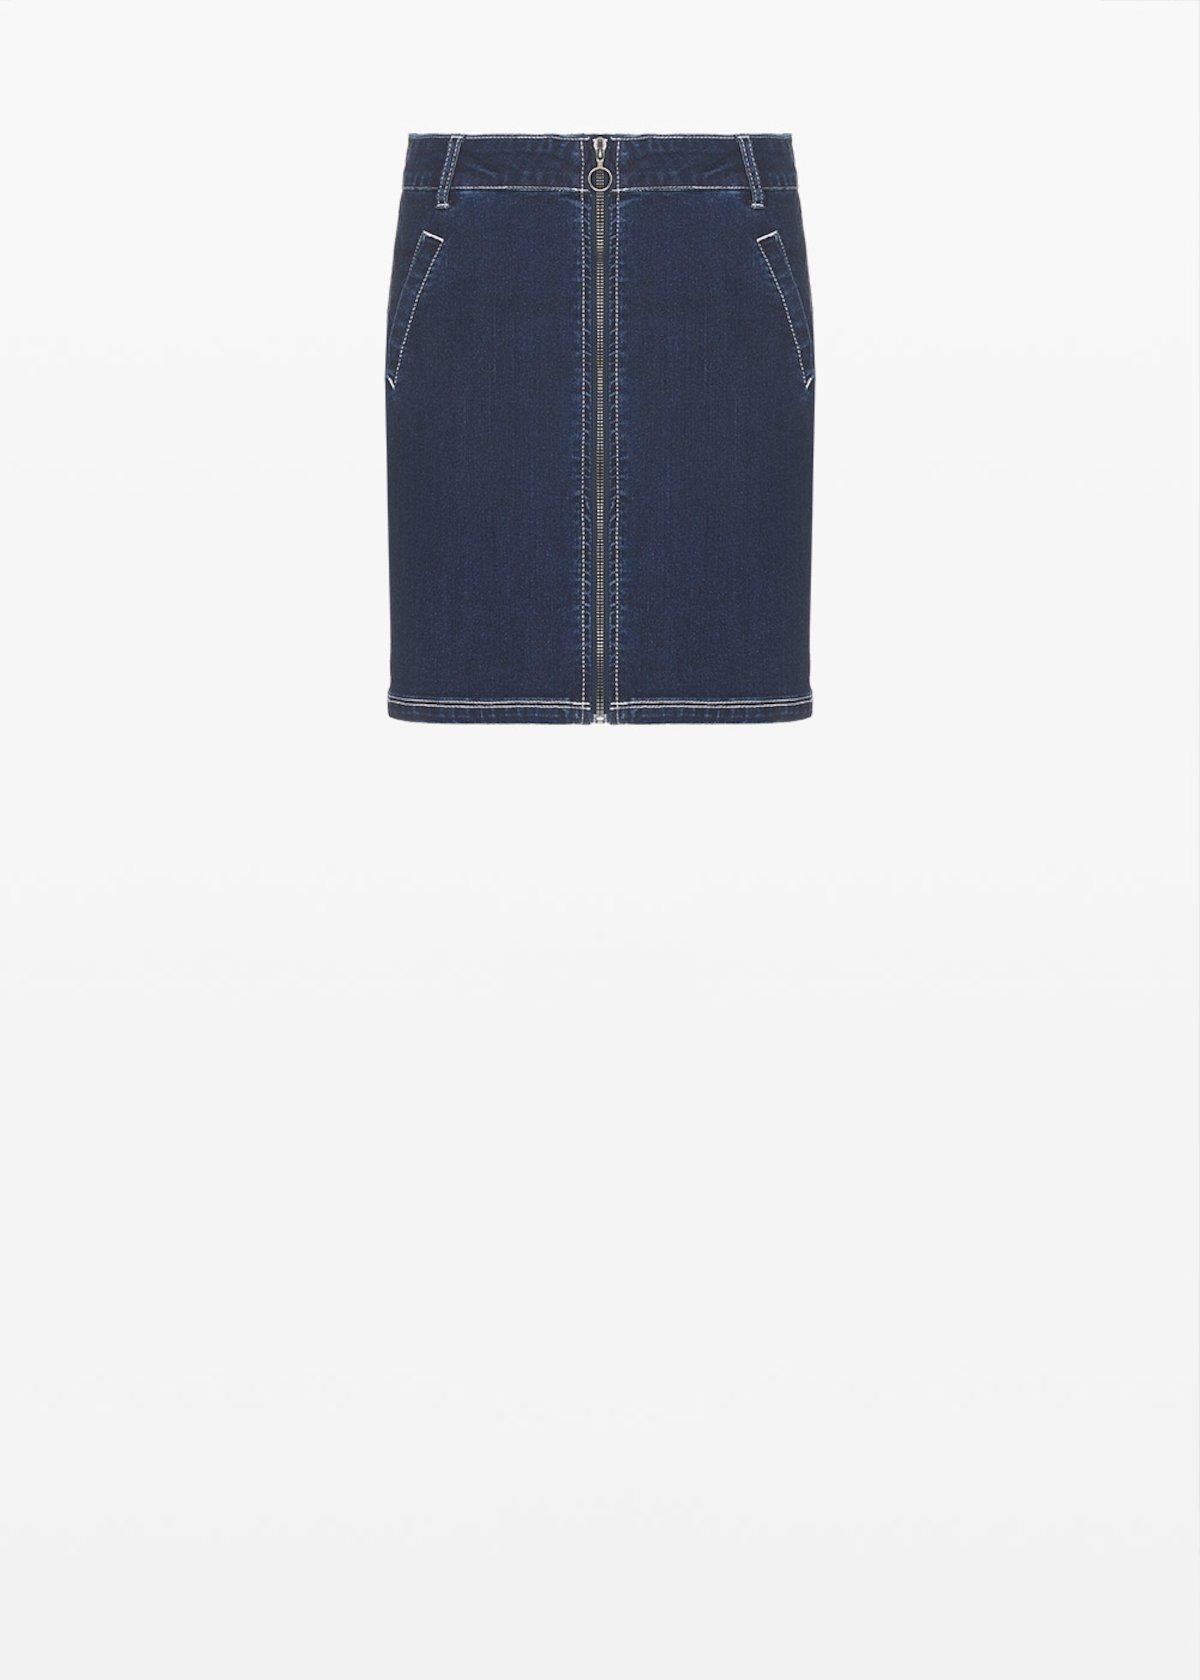 Gayla denim skirt with zip - Dark Denim - Woman - Category image